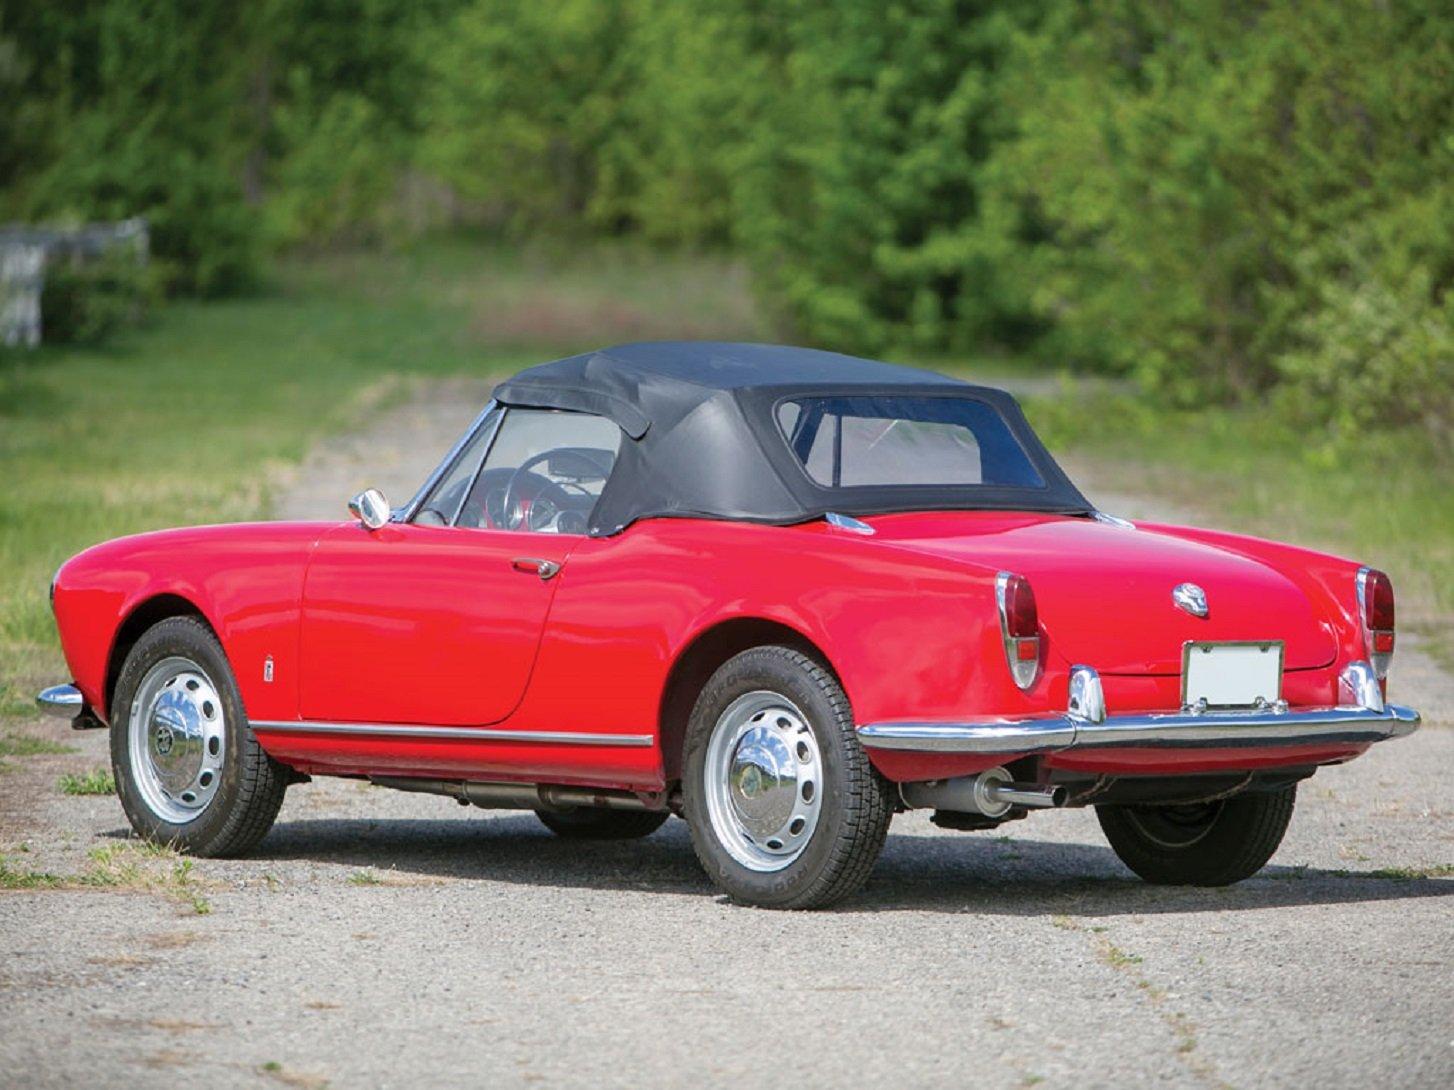 1962 alfa romeo giulietta spider classic cars wallpaper 1454x1090 772781 wallpaperup. Black Bedroom Furniture Sets. Home Design Ideas